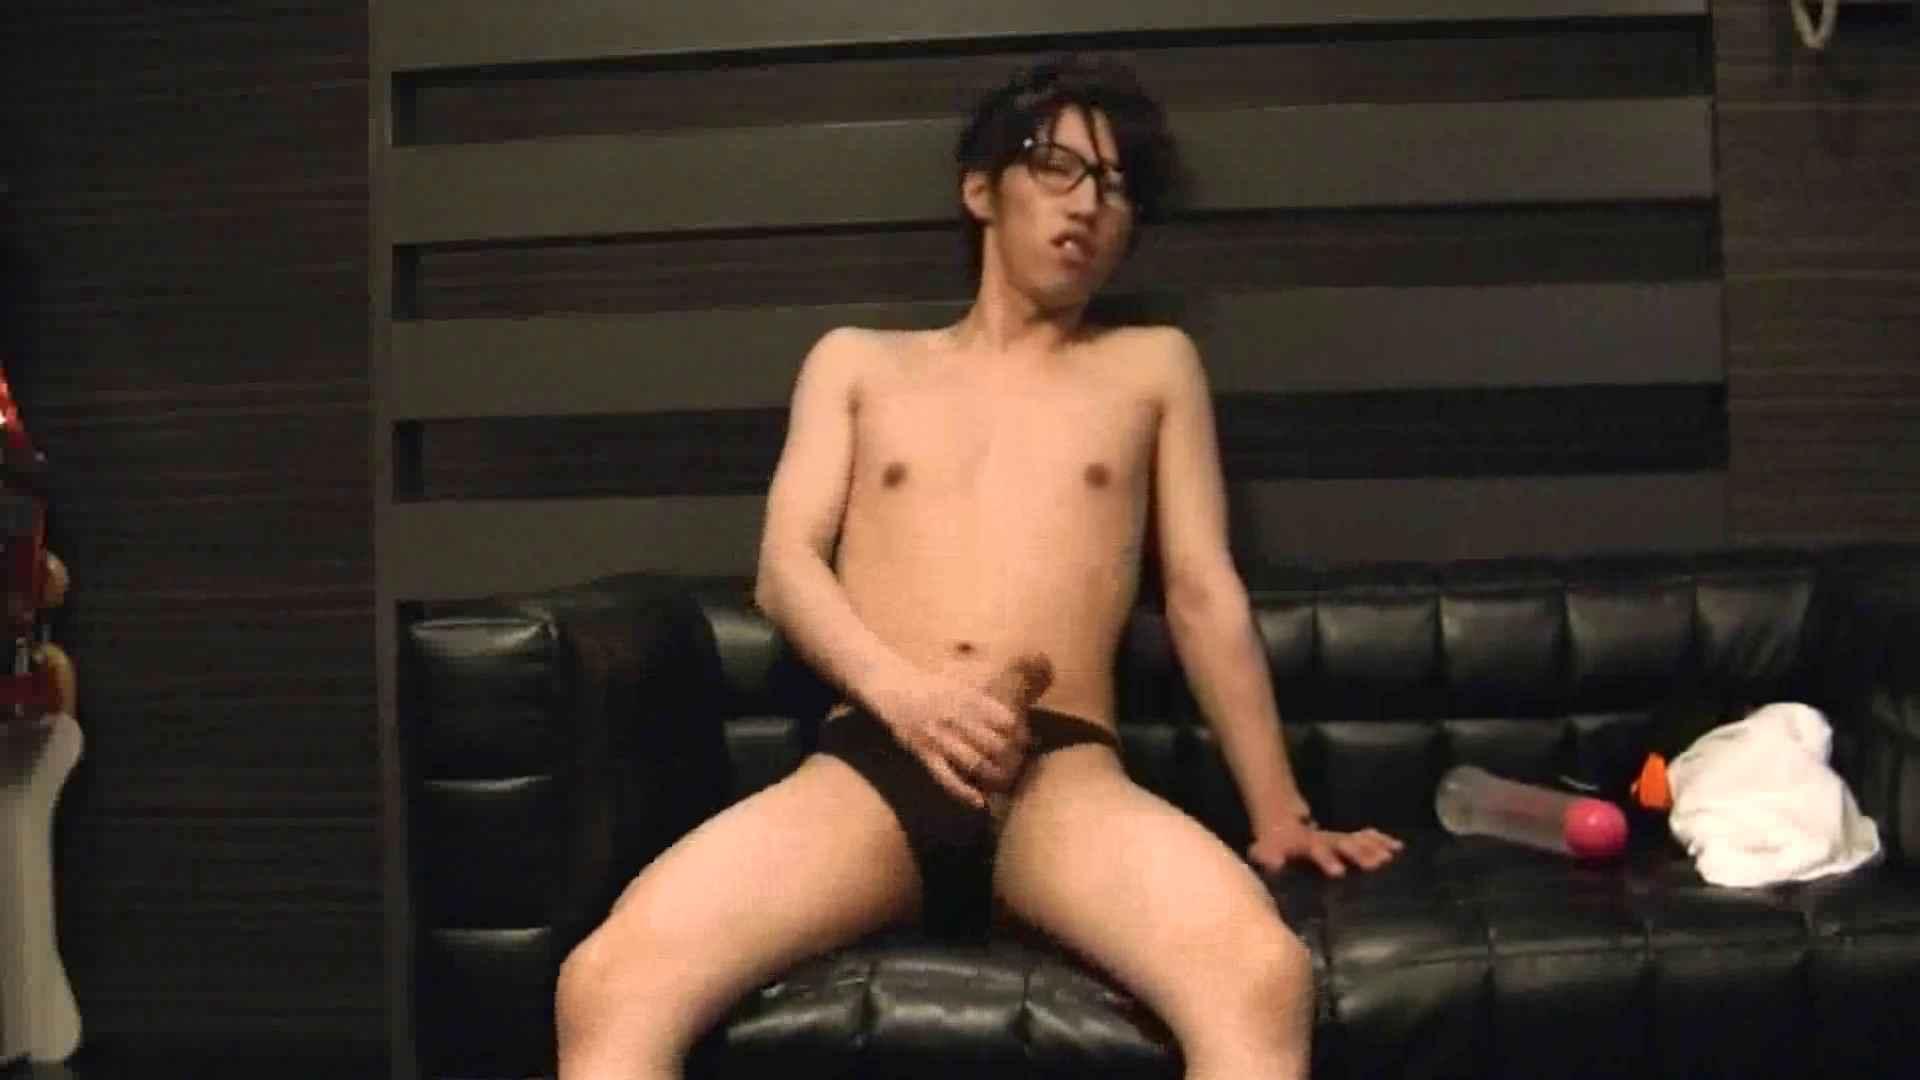 ONA見せカーニバル!! Vol3 男  93pic 67